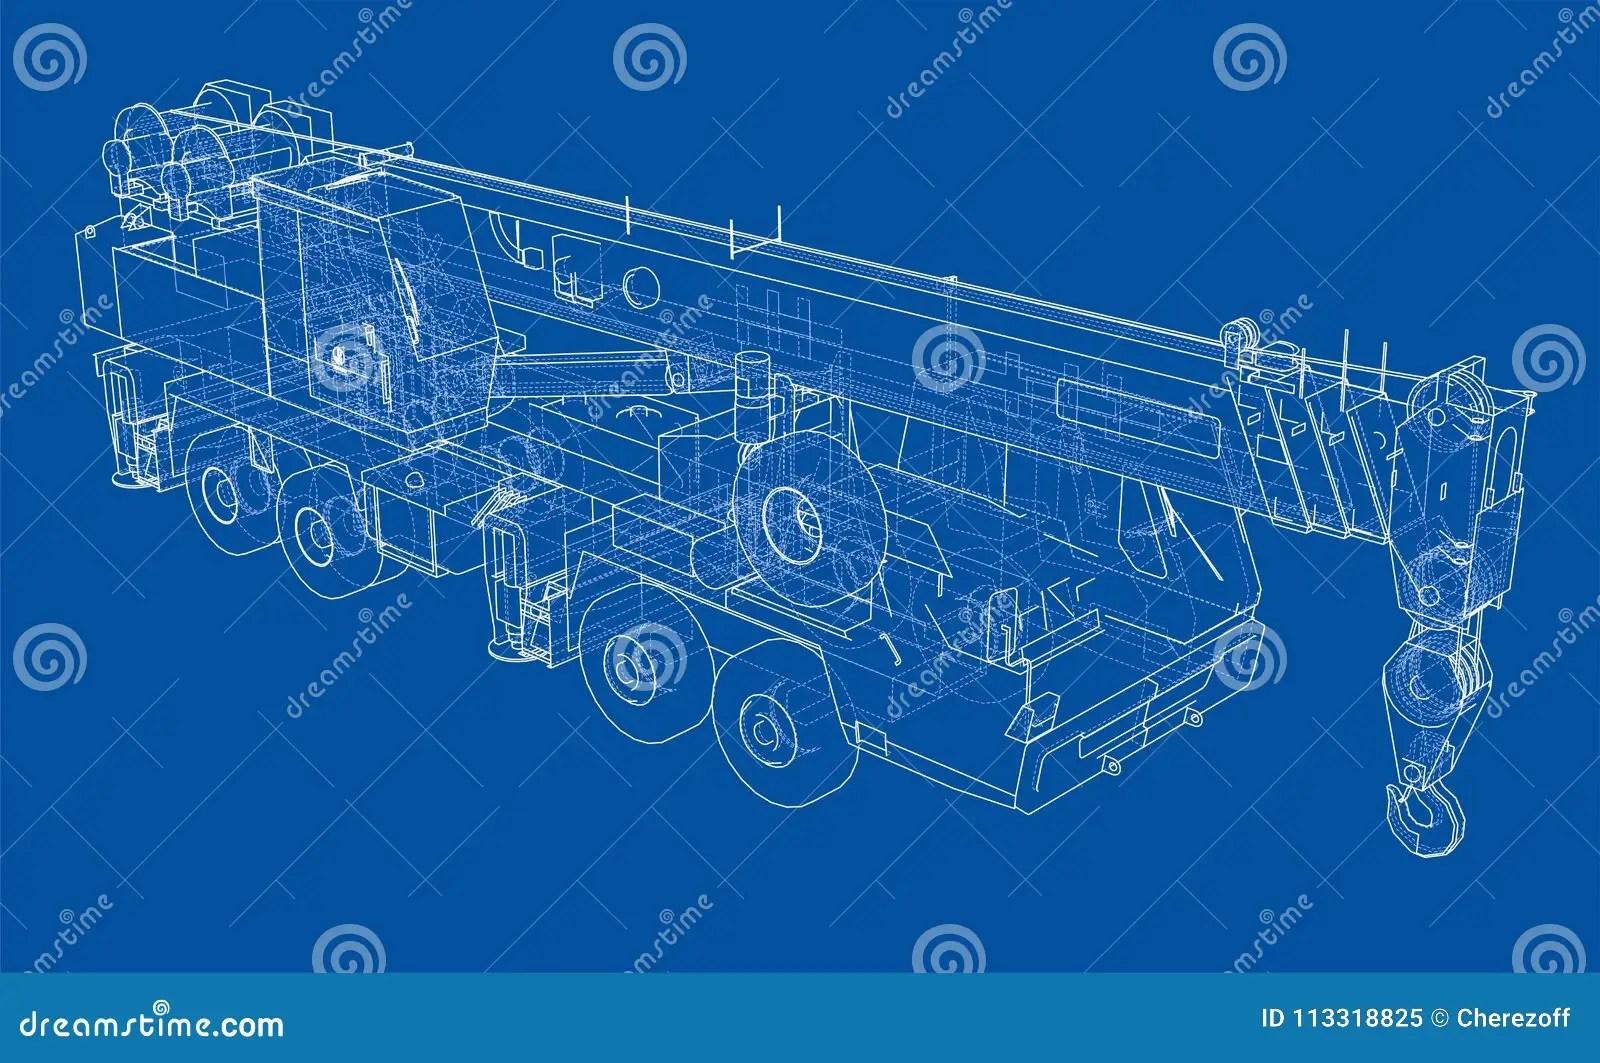 hight resolution of phone plug diagram crane components diagram autoclave diagram crane wheels diagram basic